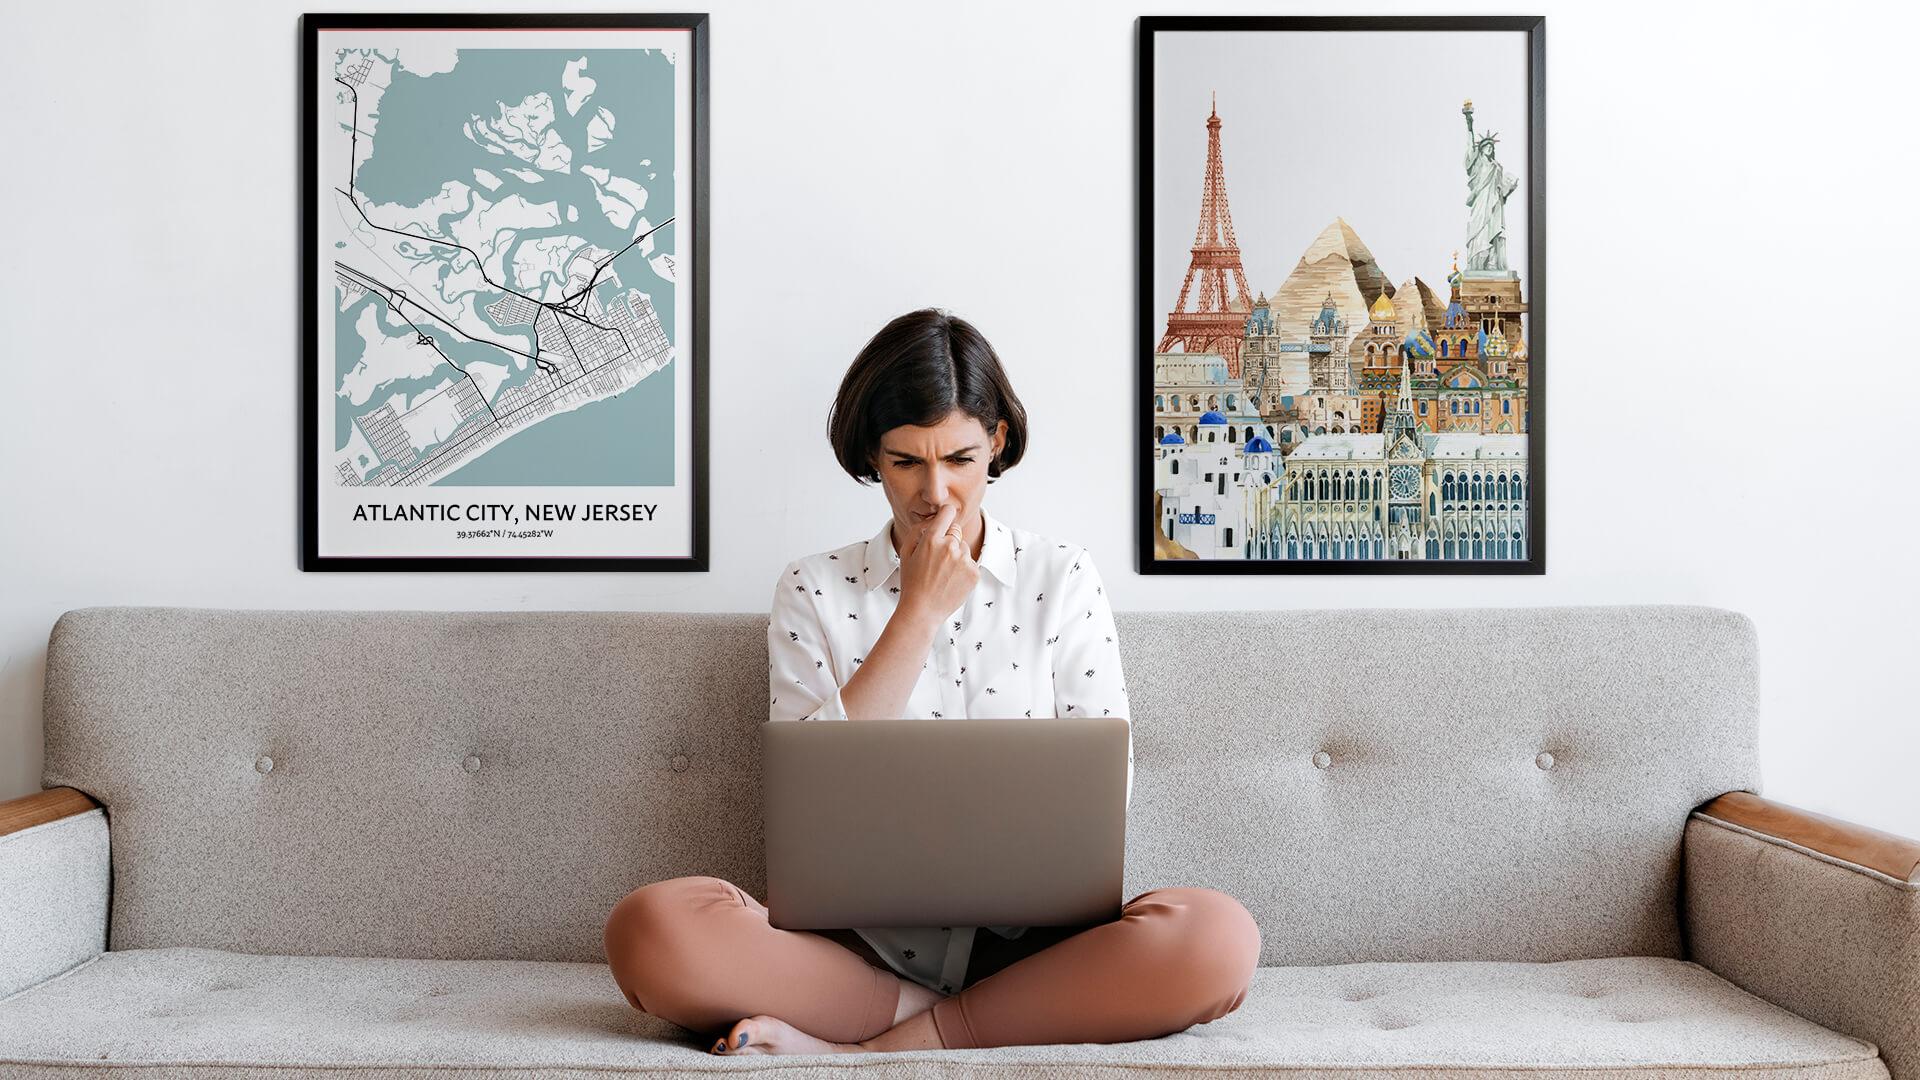 Atlantic City city map art